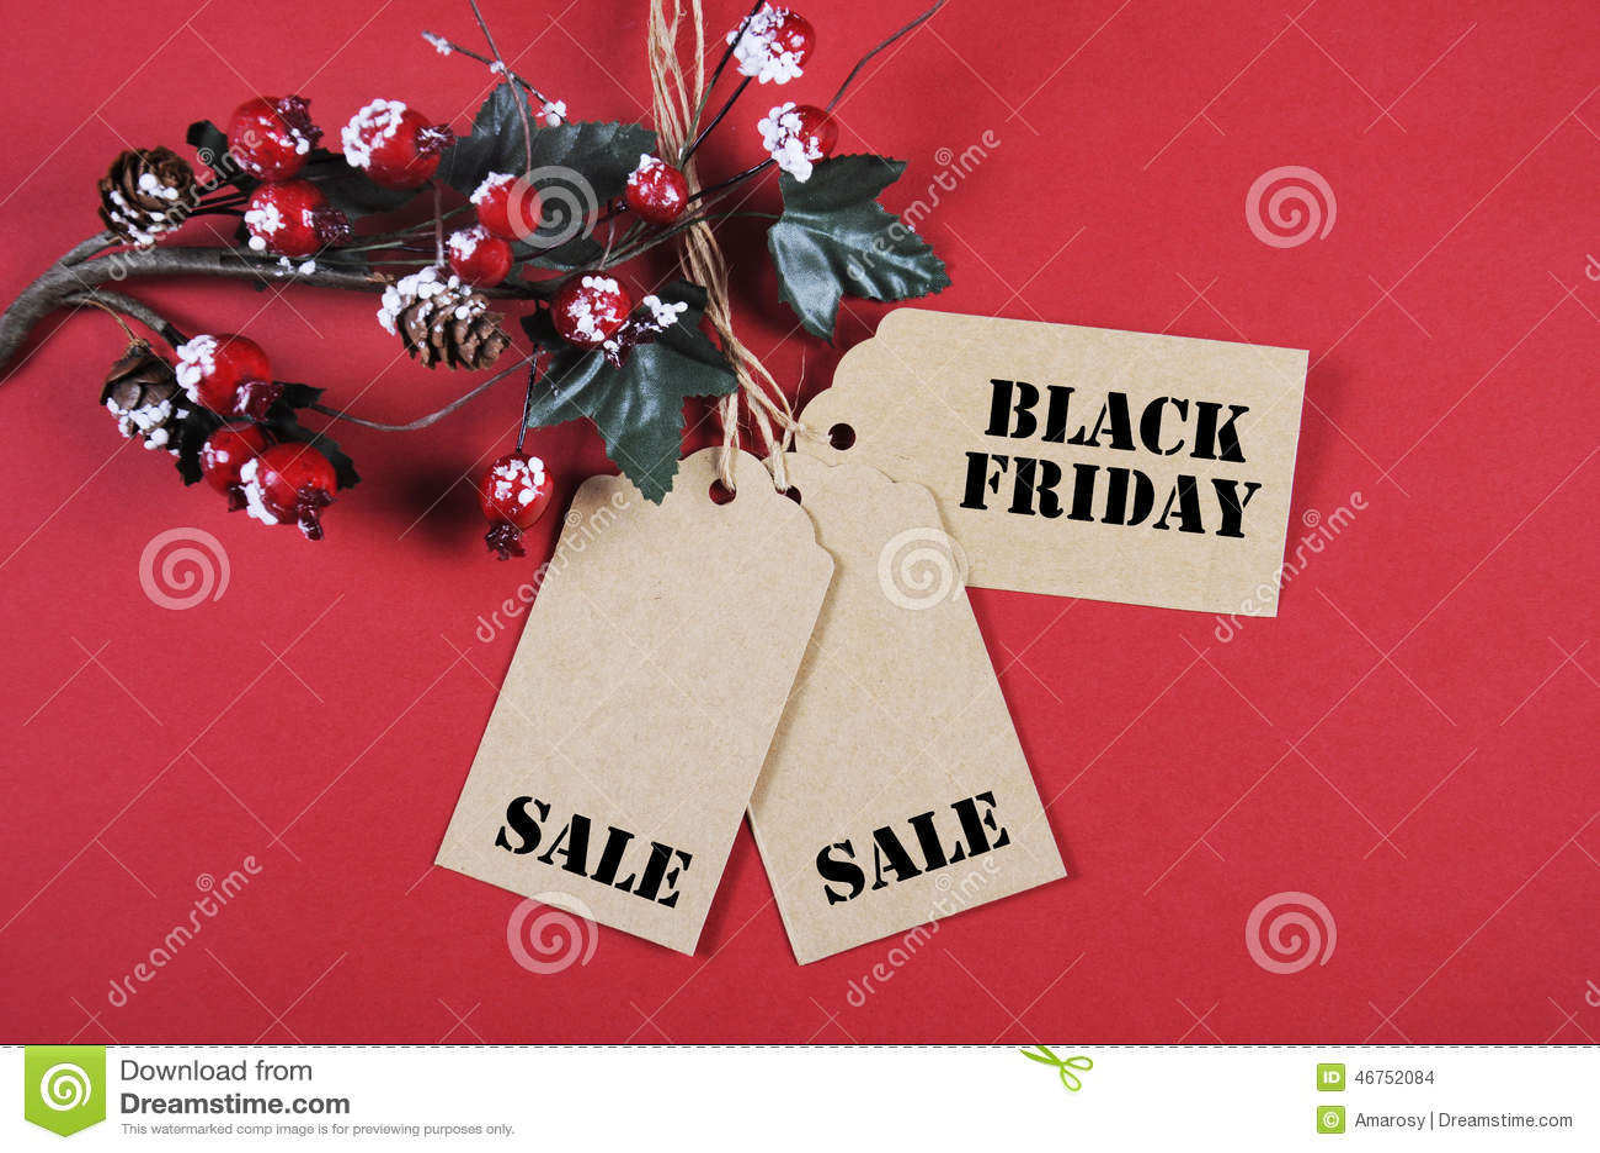 28 Best Black Friday Christmas Decorations Sale Black Friday Christmas Decorations Specials